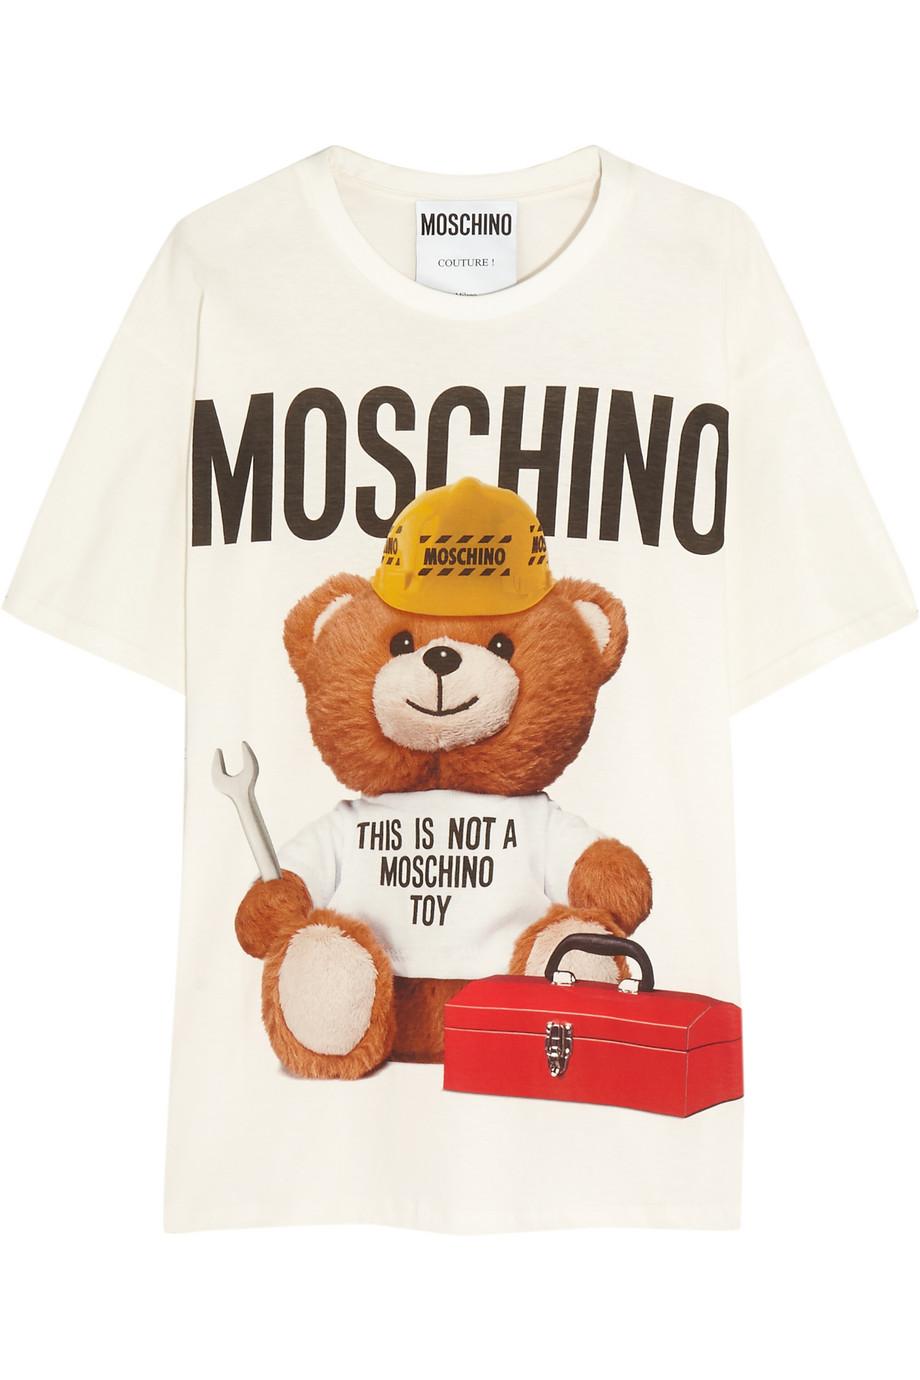 Moschino Oversized Printed Cotton-Jersey T-Shirt, White, Women's, Size: L